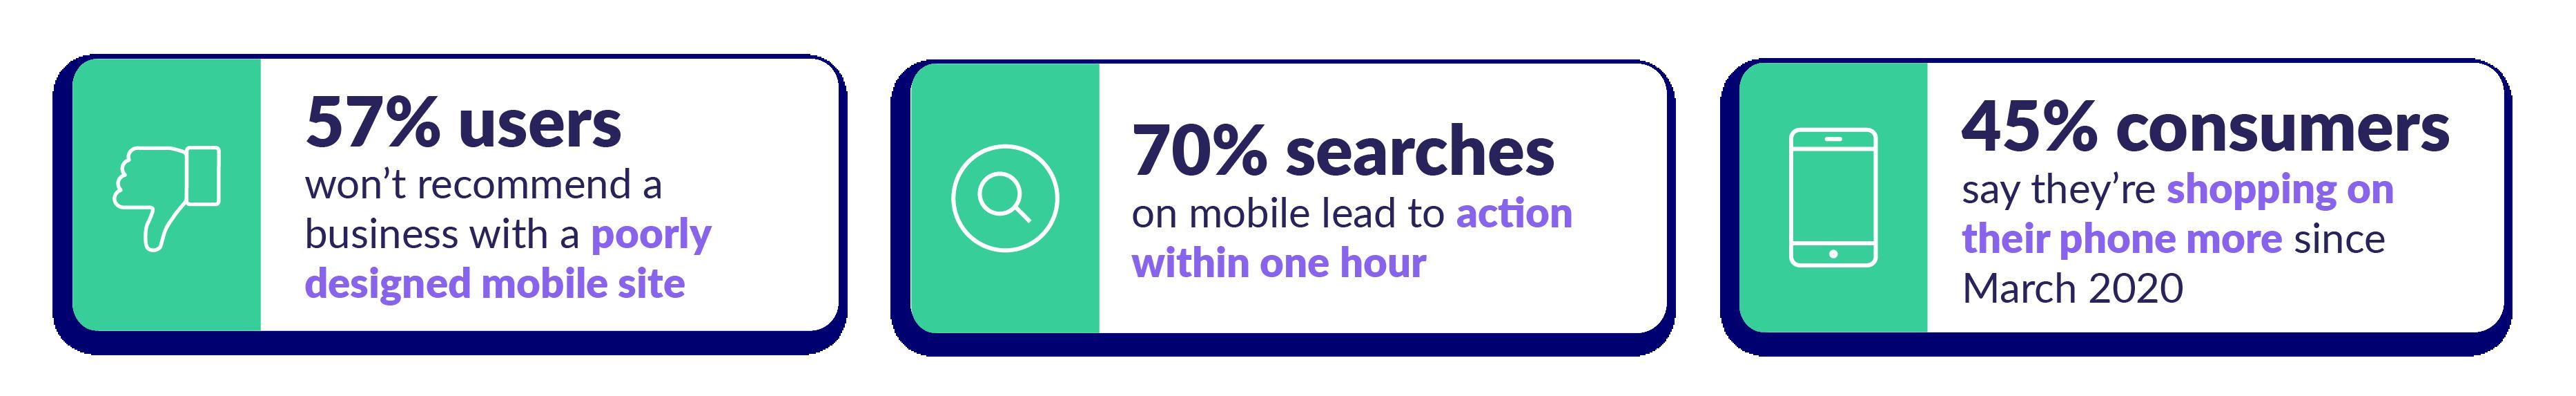 mobile commerce trend statistics